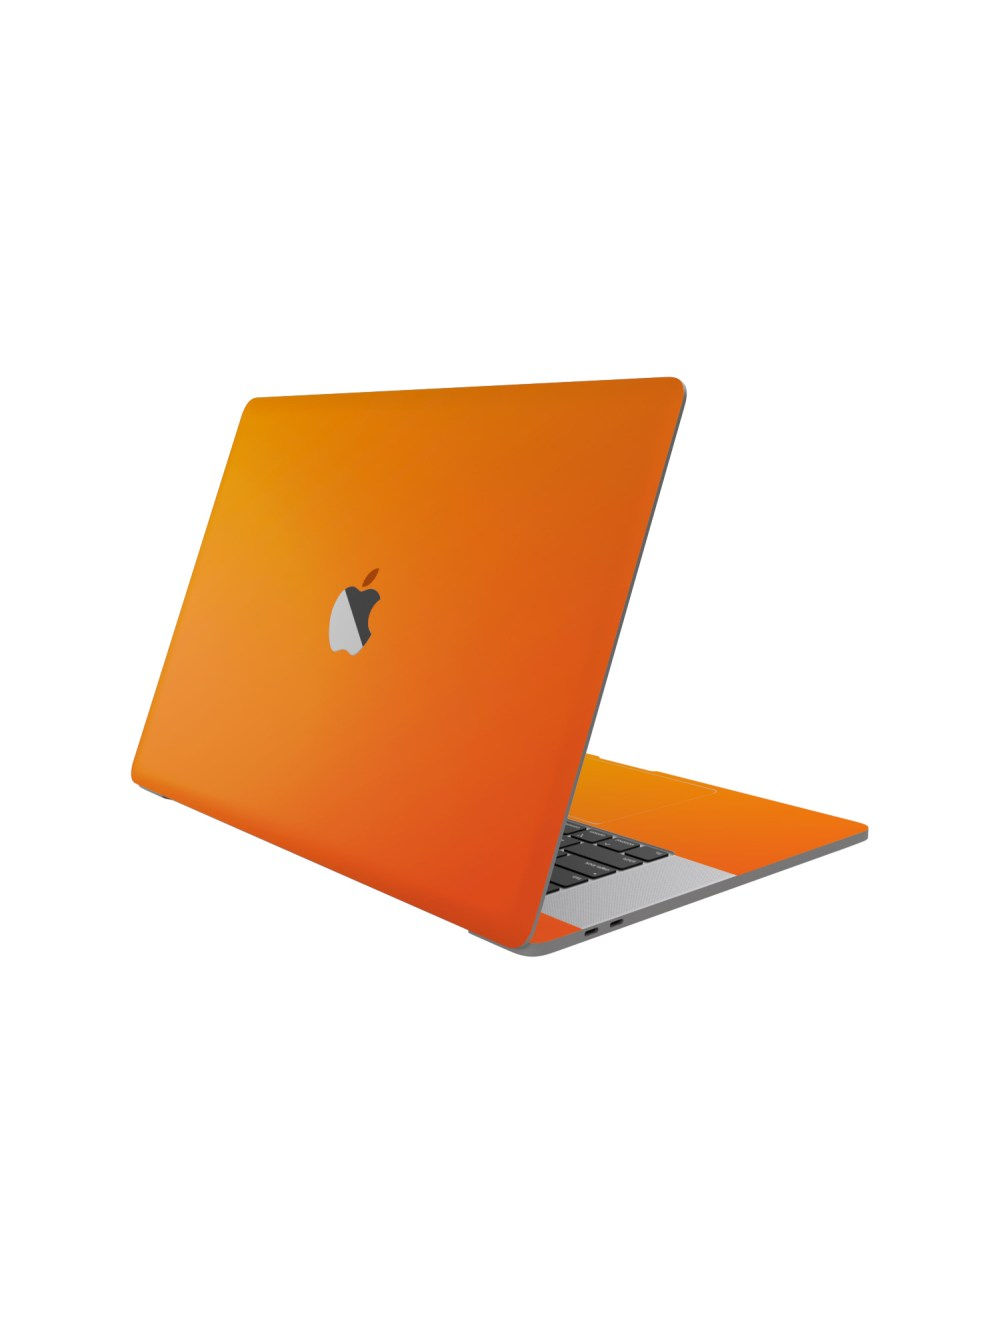 Matt Orange Skin for Macbook Pro M1